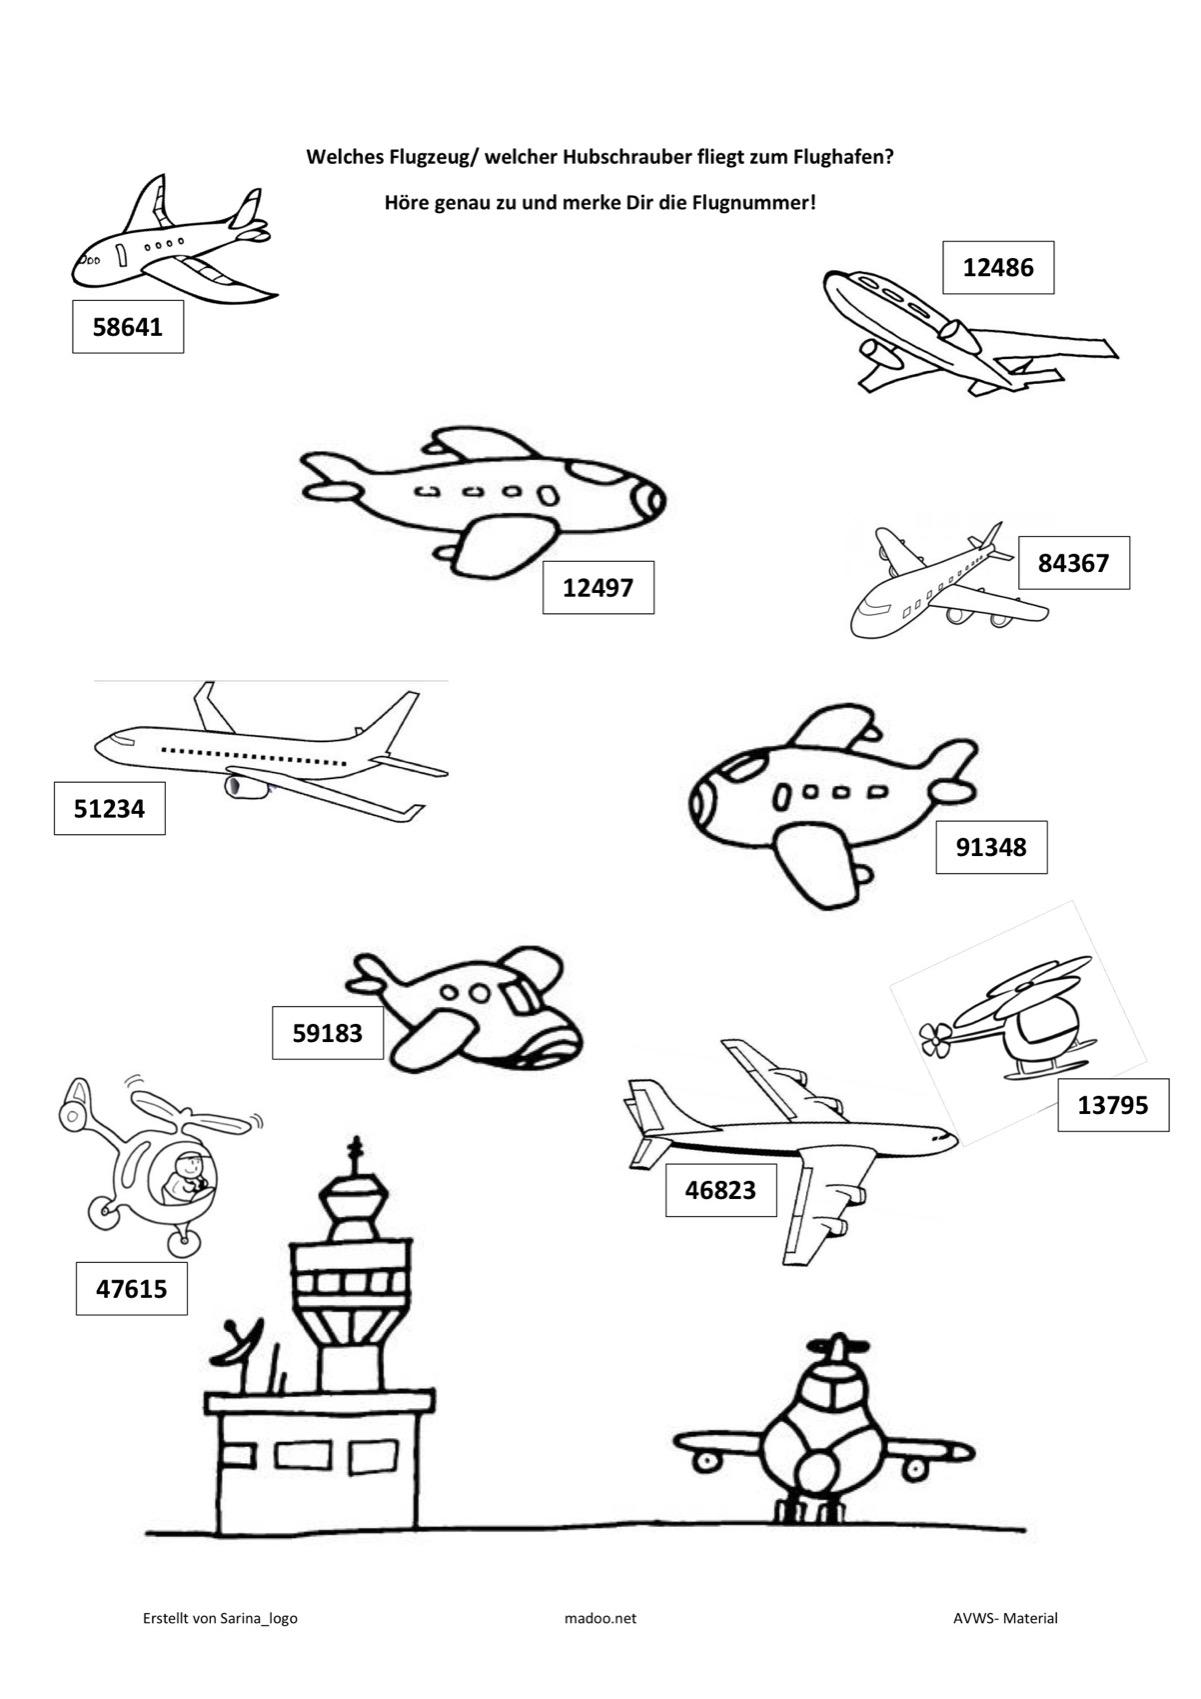 Merkfähigkeit Flugzeugspiel - SES - madoo.net